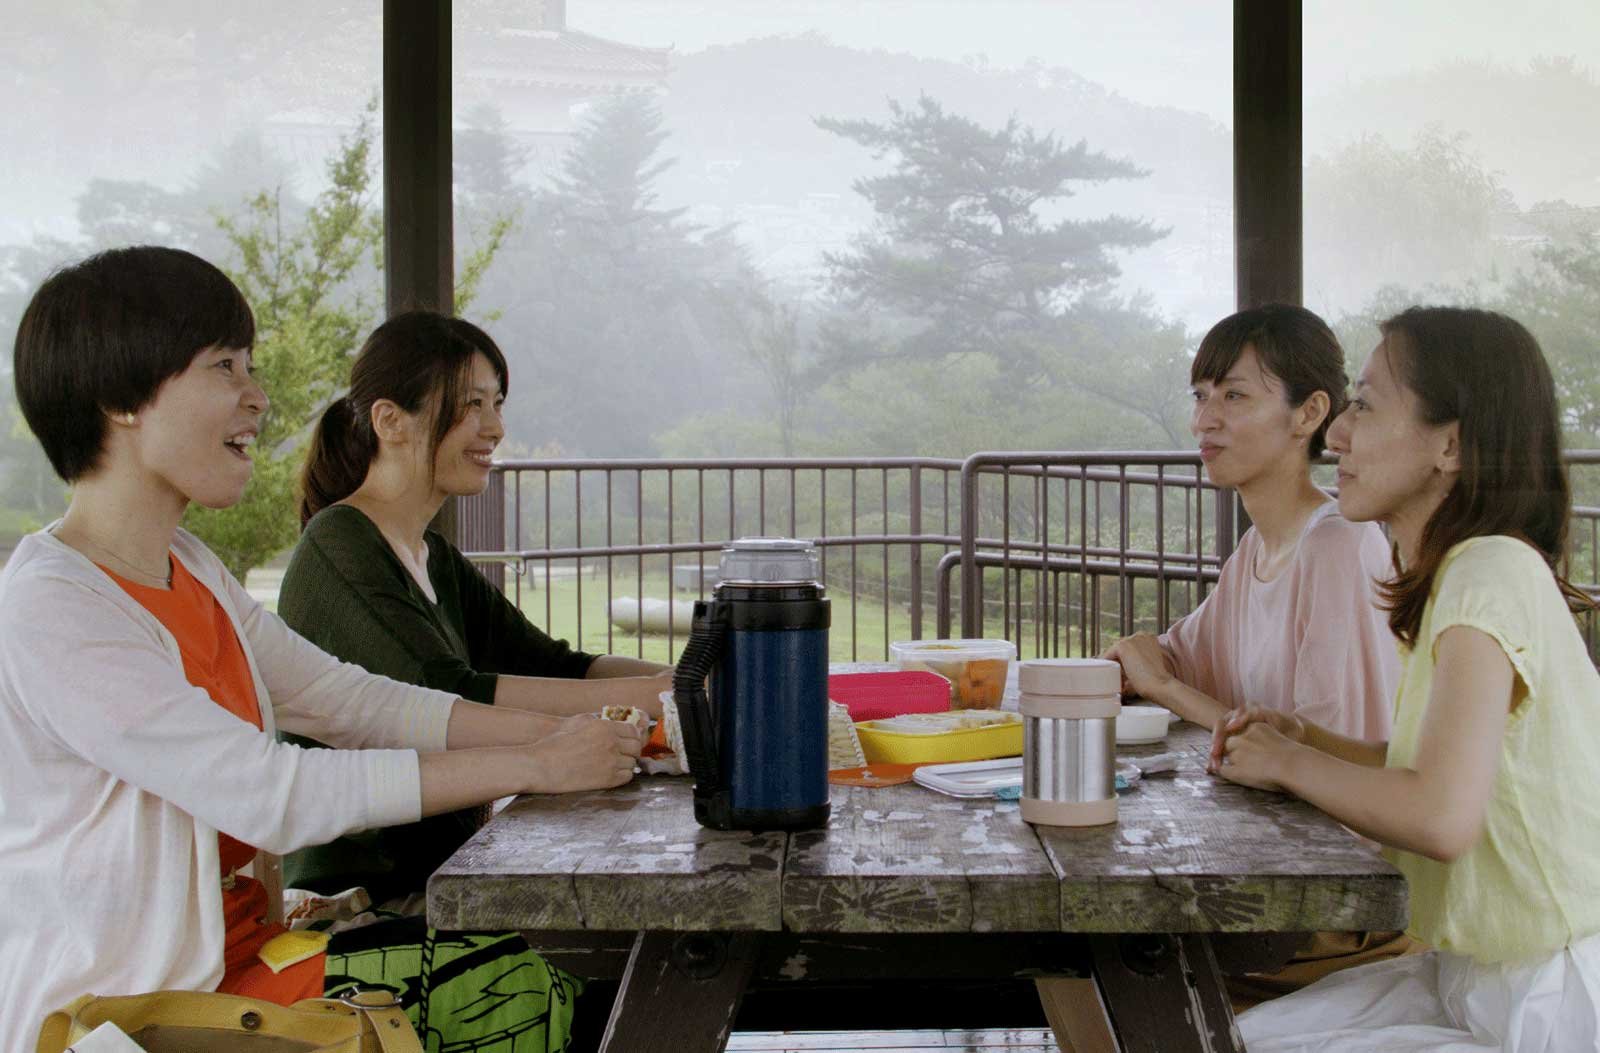 Senses 1&2 critique film